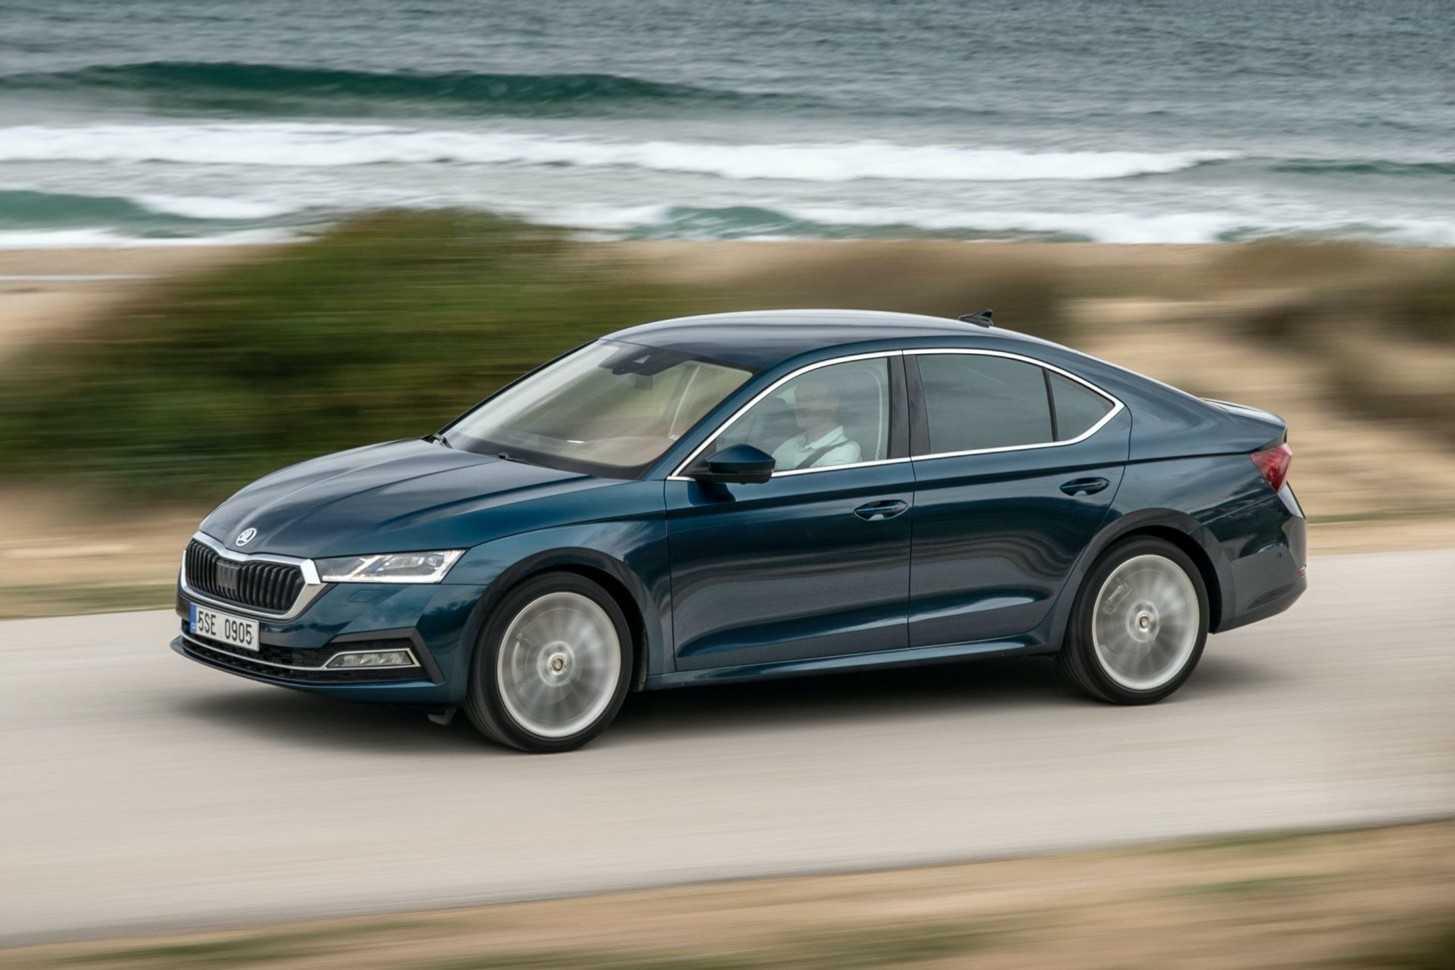 Skoda octavia 2020 - фото, цена и характеристики модели в новом кузове